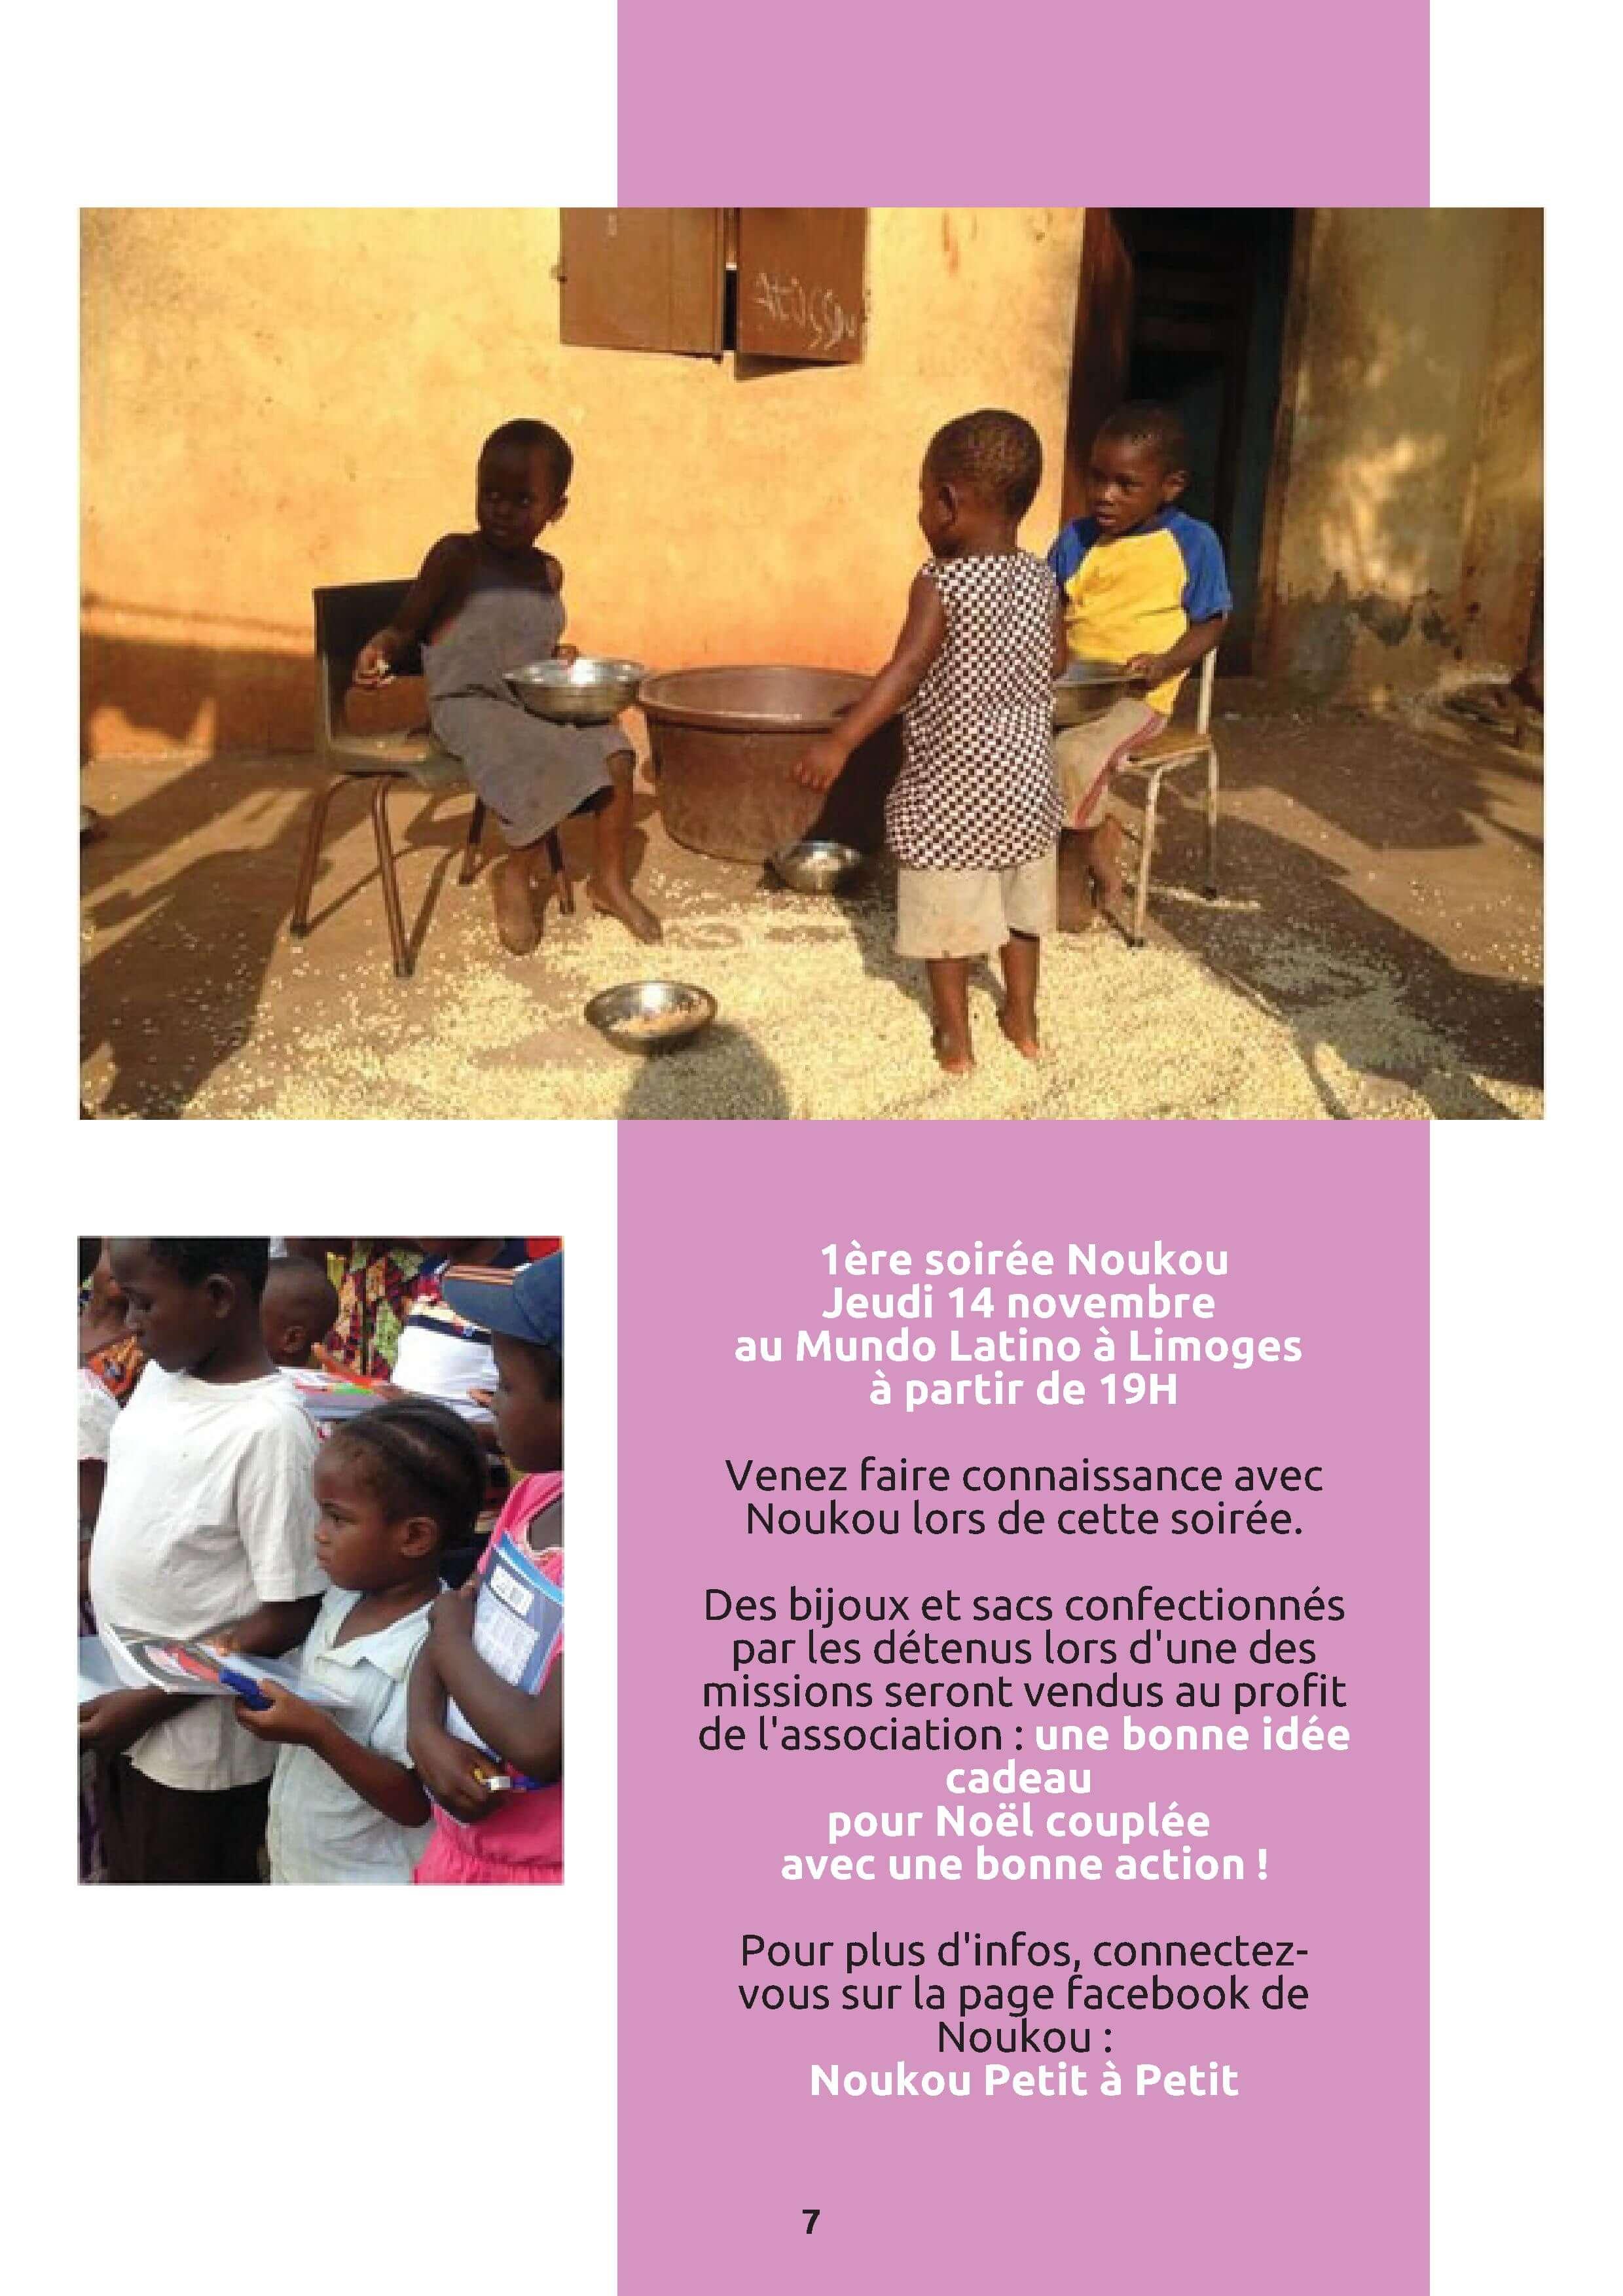 article-karine-benoit-p.4-magsesame-n°-7-Novembre-2013